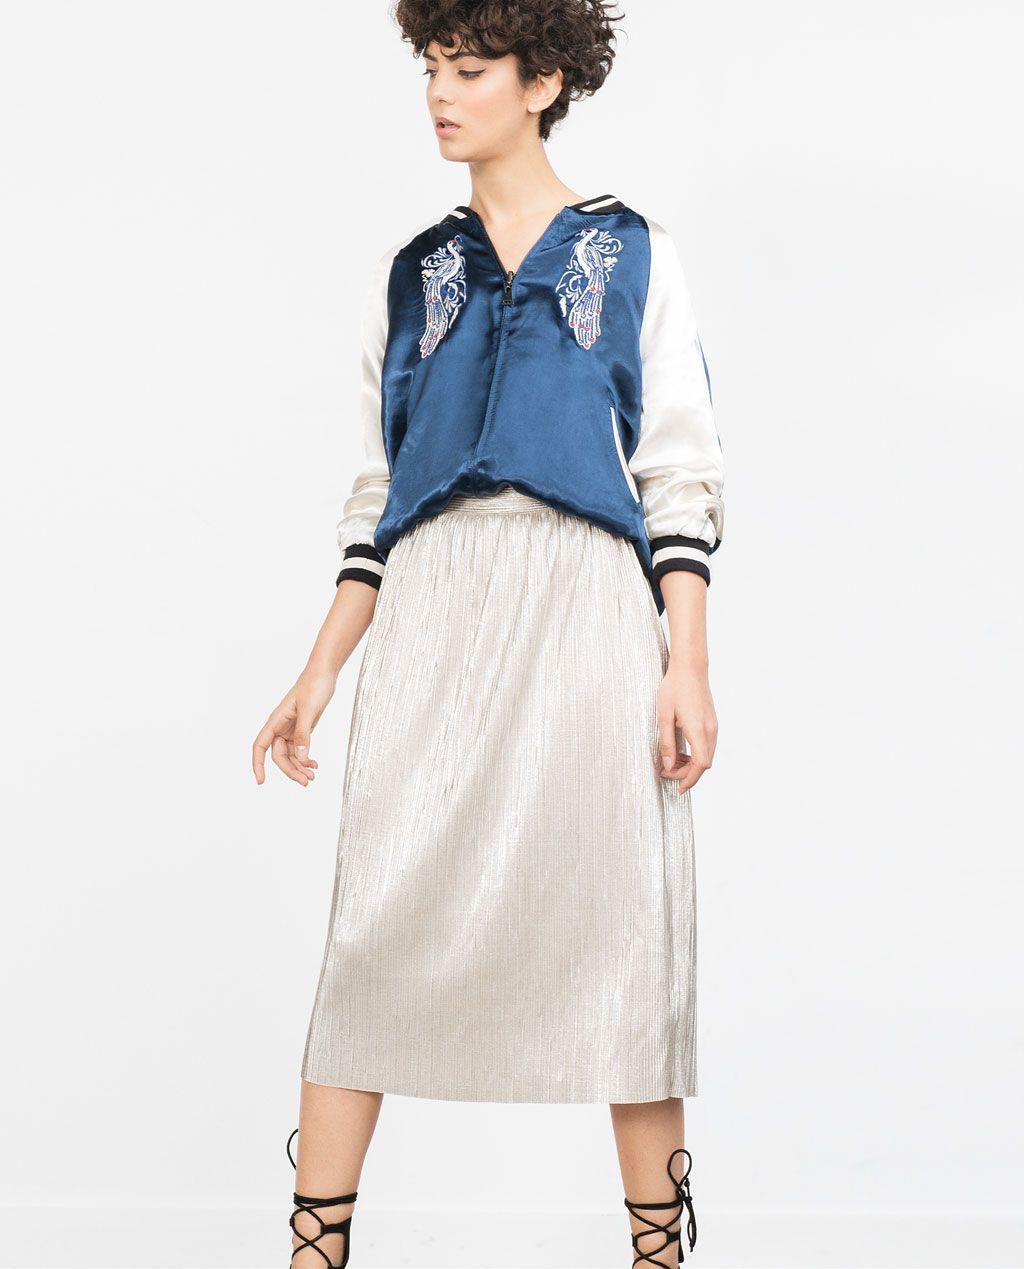 7ff137cd4 FALDA PLATEADA PLISADA | - WISH LIST - | Skirts, Fashion outfits ...